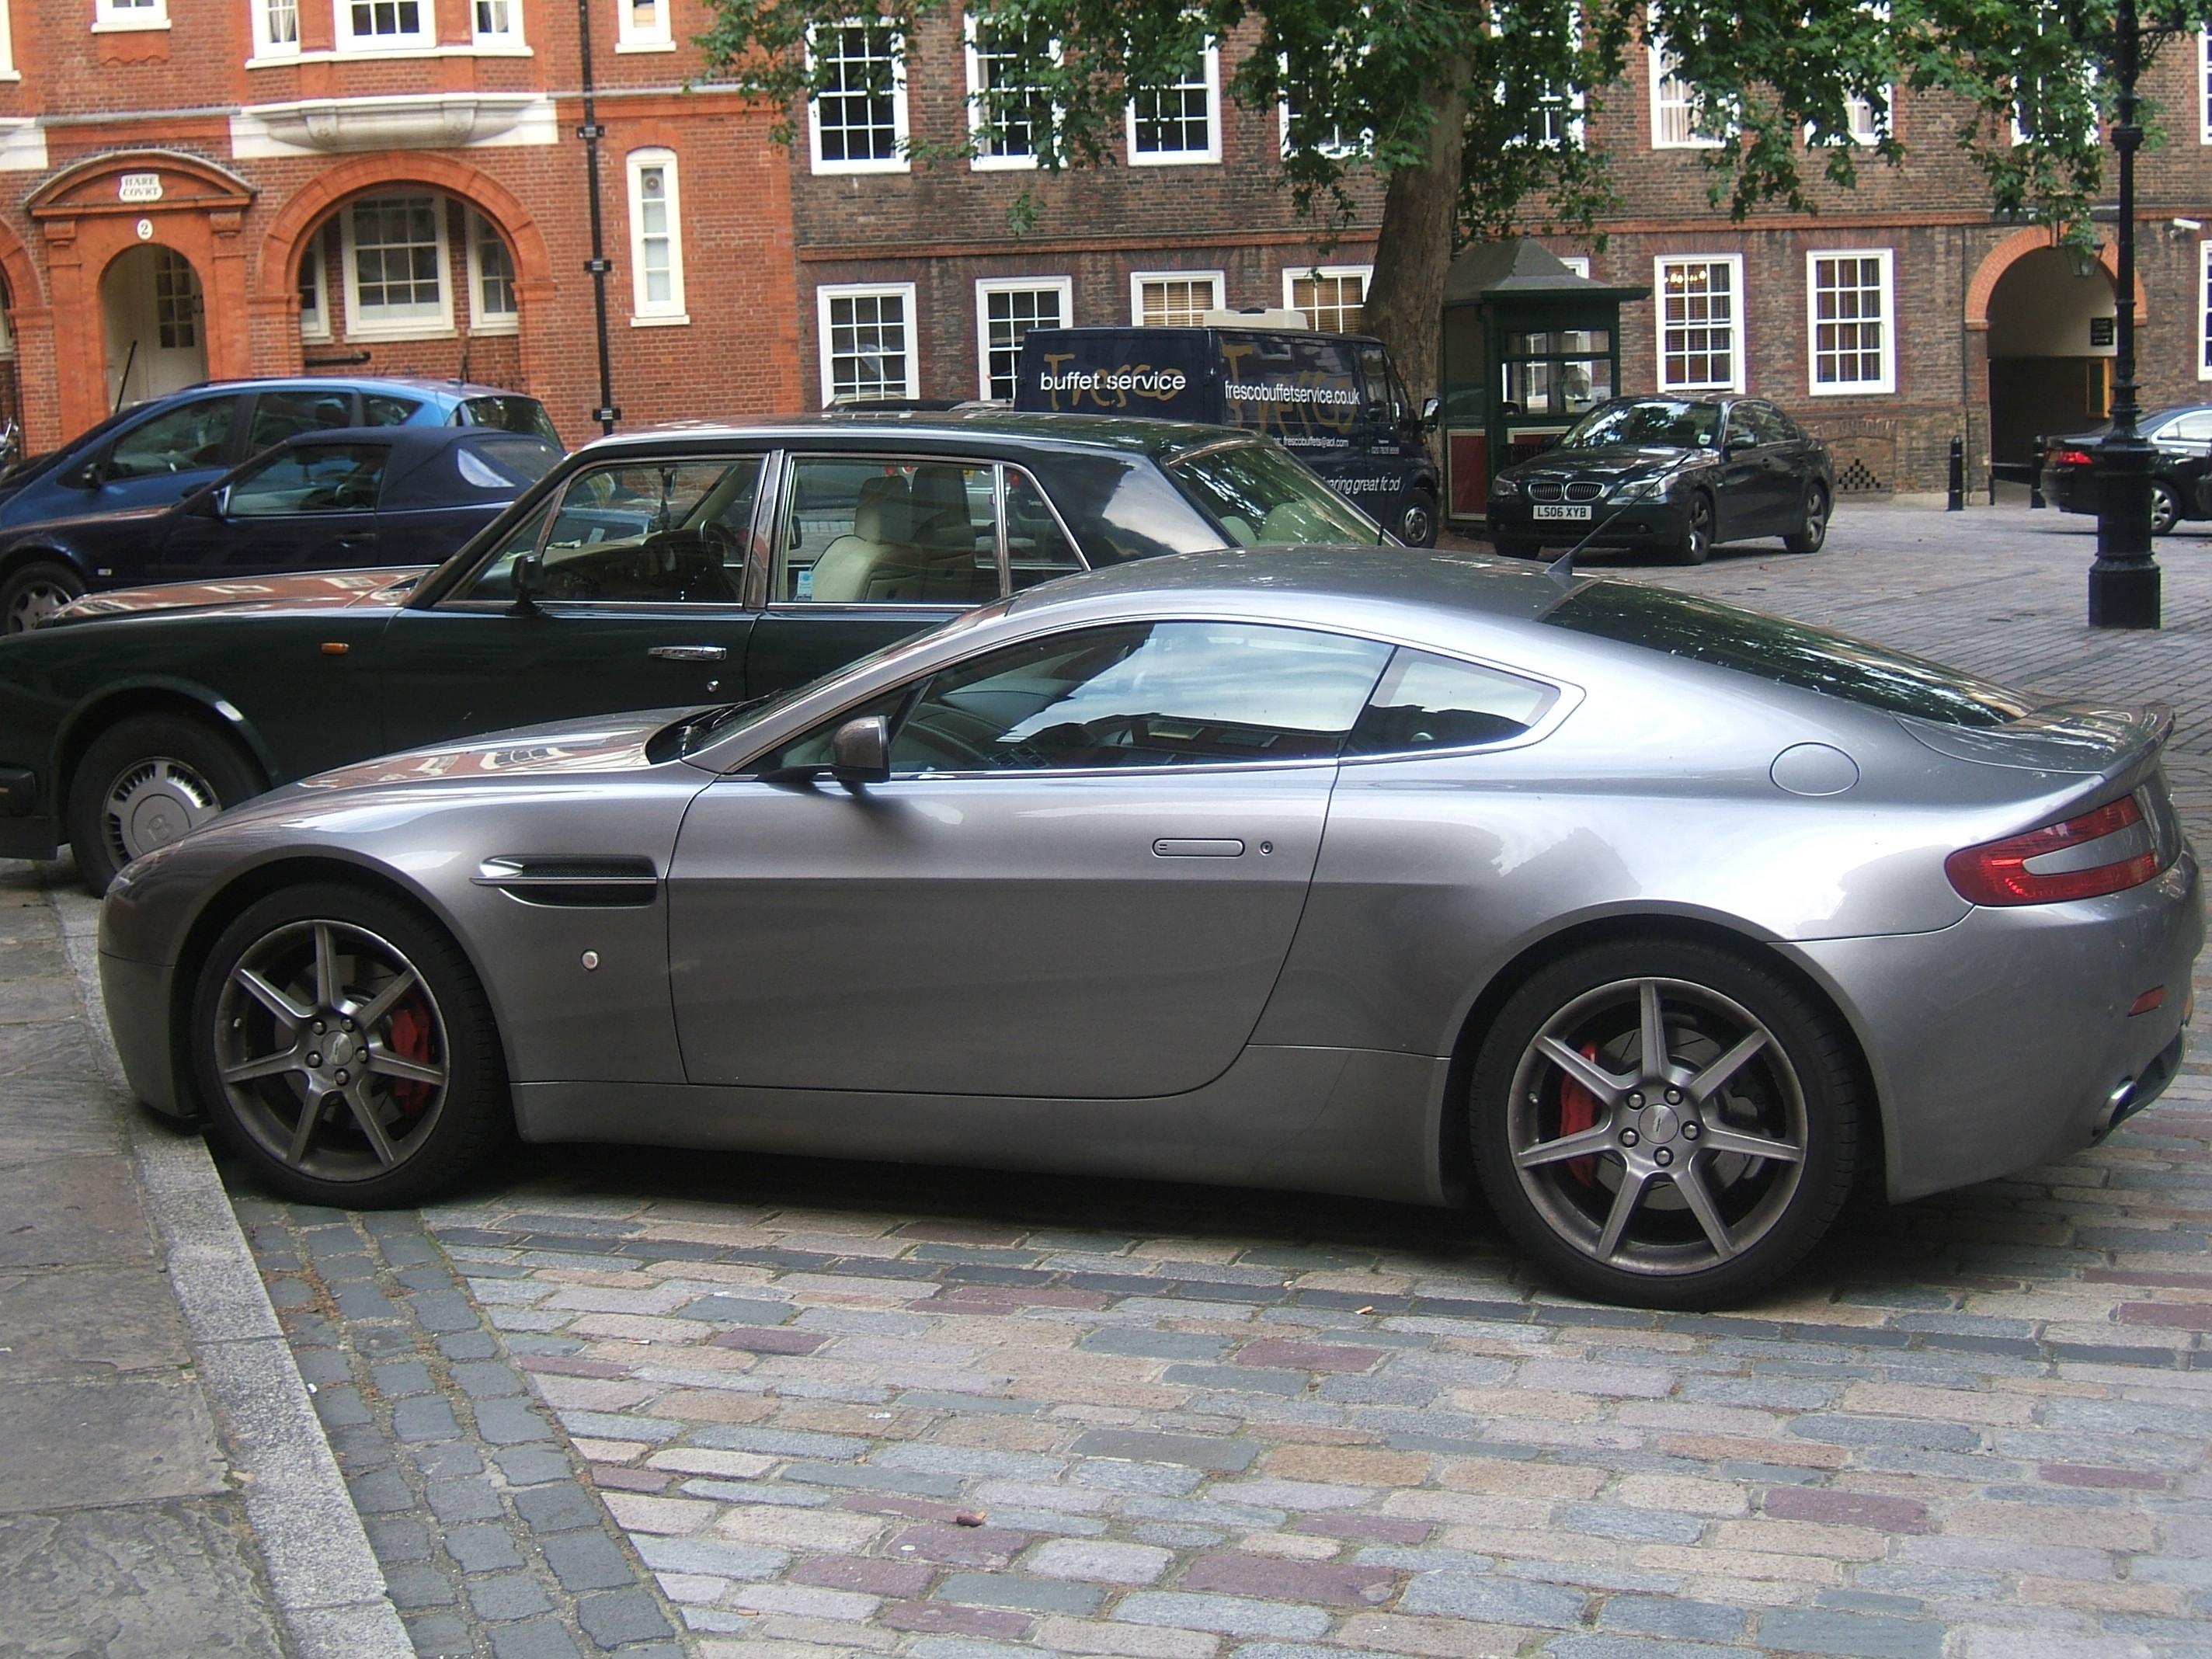 File Grey Aston Martin V8 Vantage 20090805 Jpg Wikimedia Commons